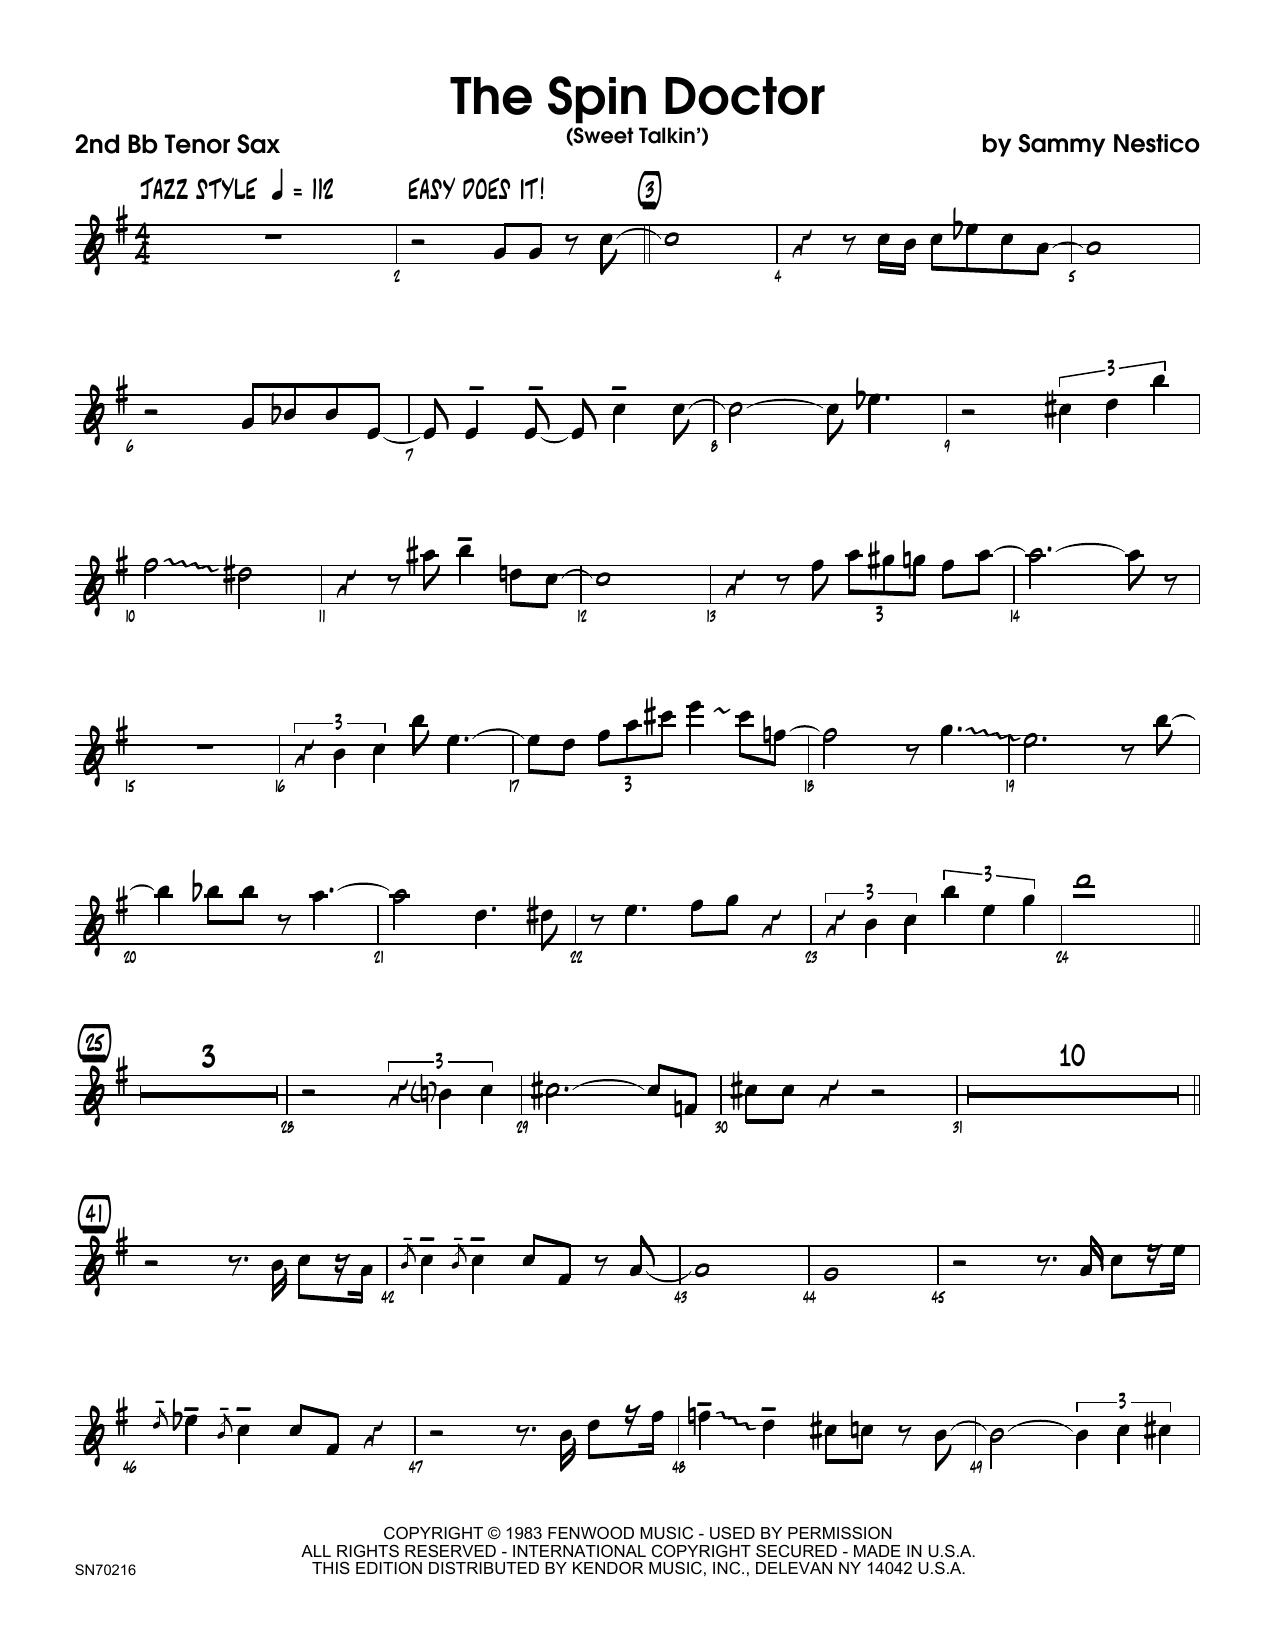 The Spin Doctor (Sweet Talkin') - 2nd Bb Tenor Saxophone